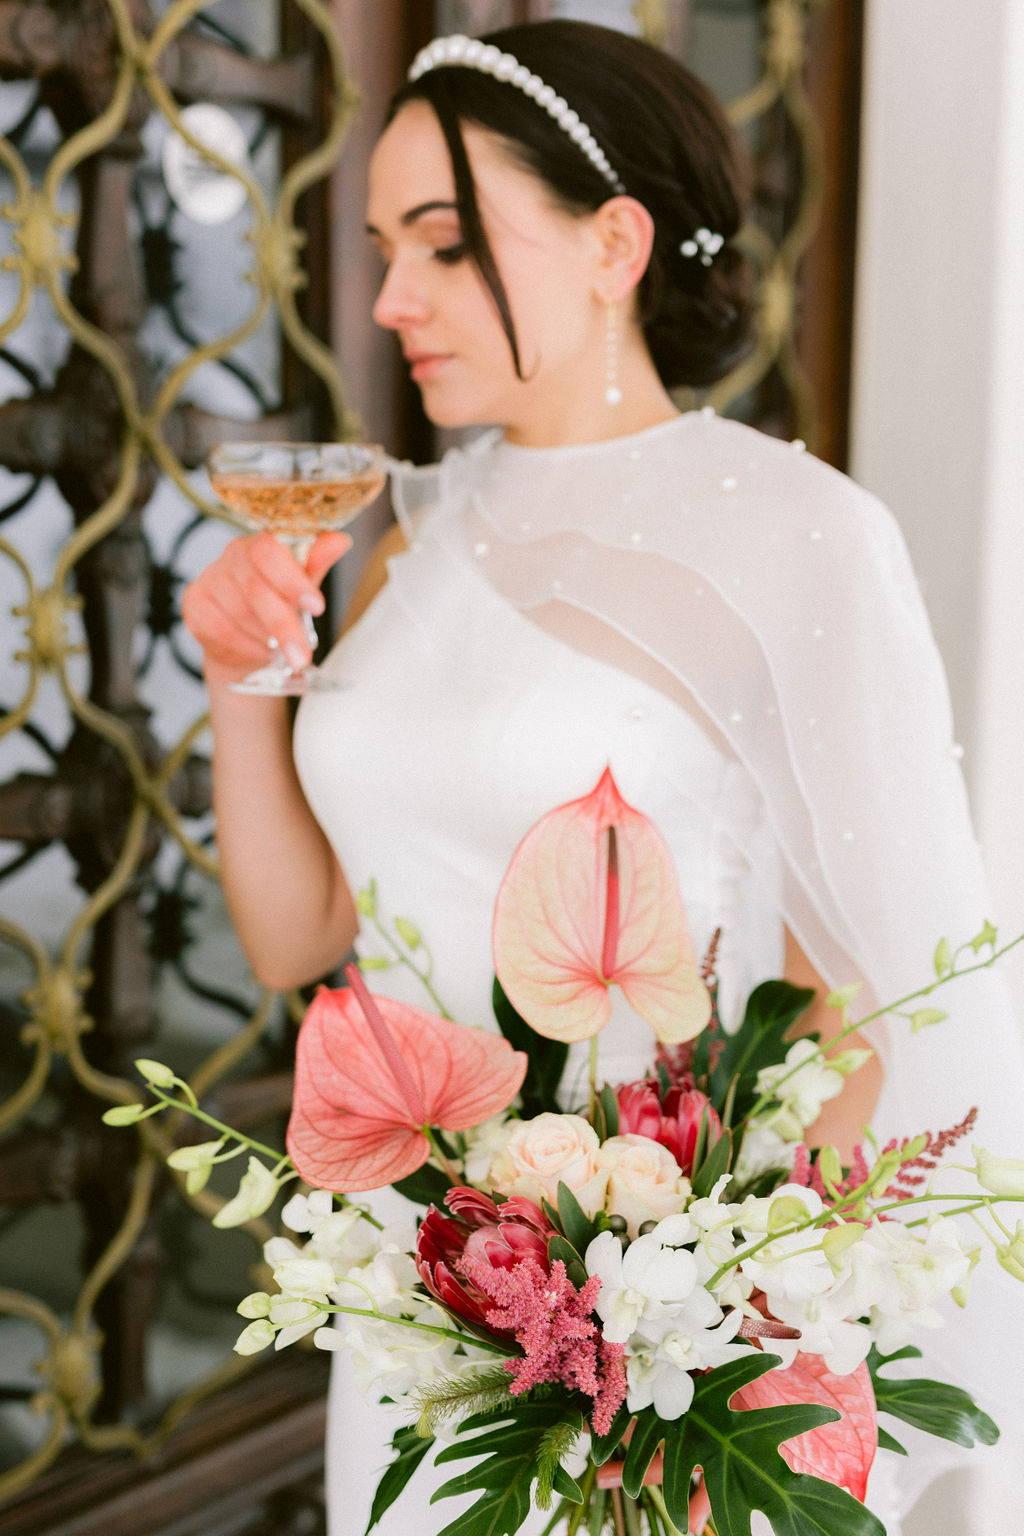 Salome-Floristik-Dresden_Schlichter Brautstrauß Rose Distel Eukalyptus